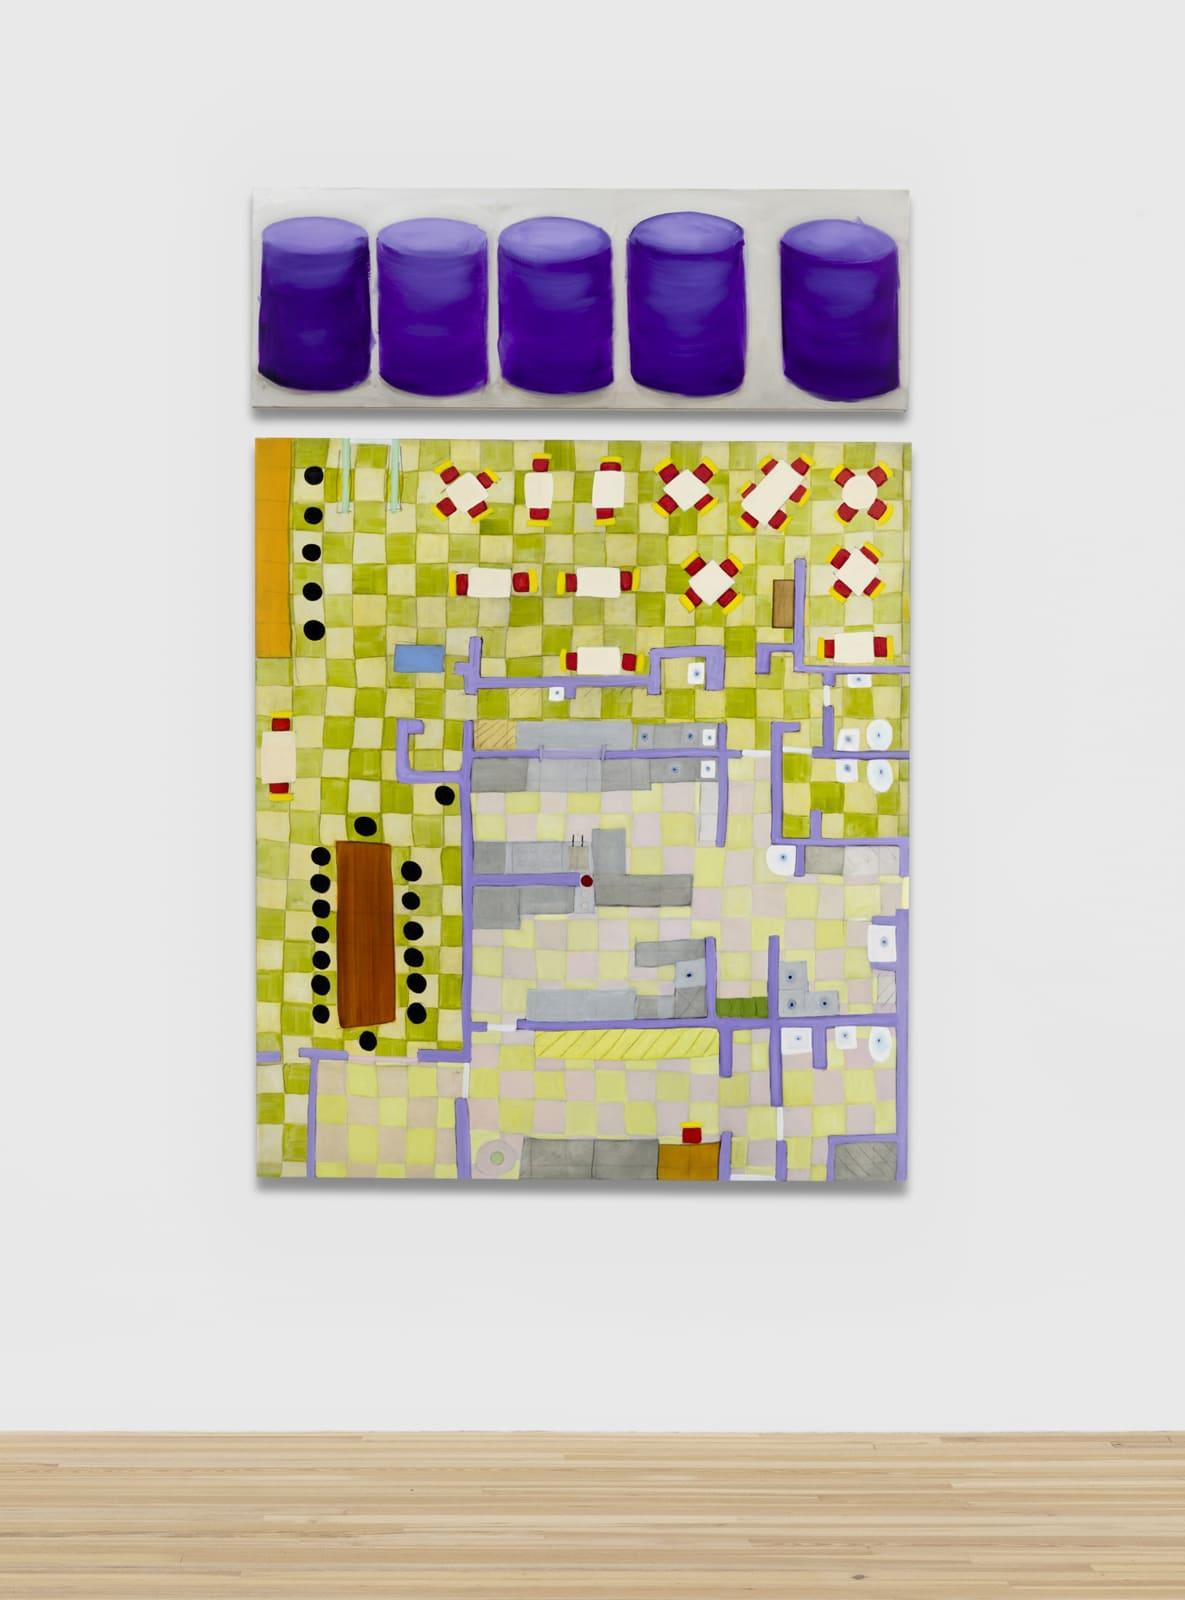 Kim Dingle Purple Ottomans - Restaurant Mandala, 2012/2020 Oil on canvas Diptych: 86 x 60 in (218.4 x 152.4 cm) overall